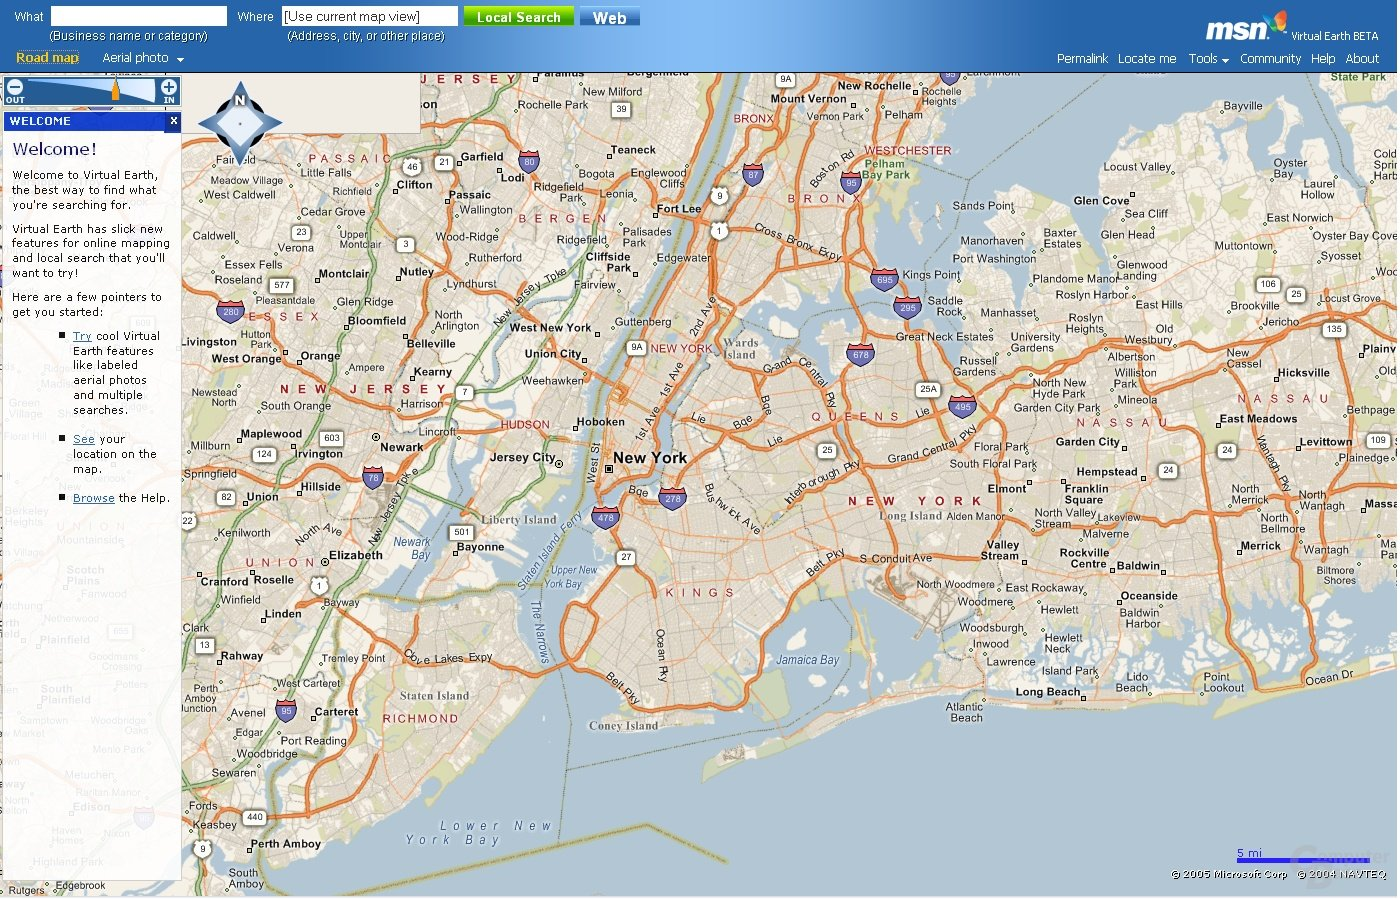 Virtual Earth - Road Map